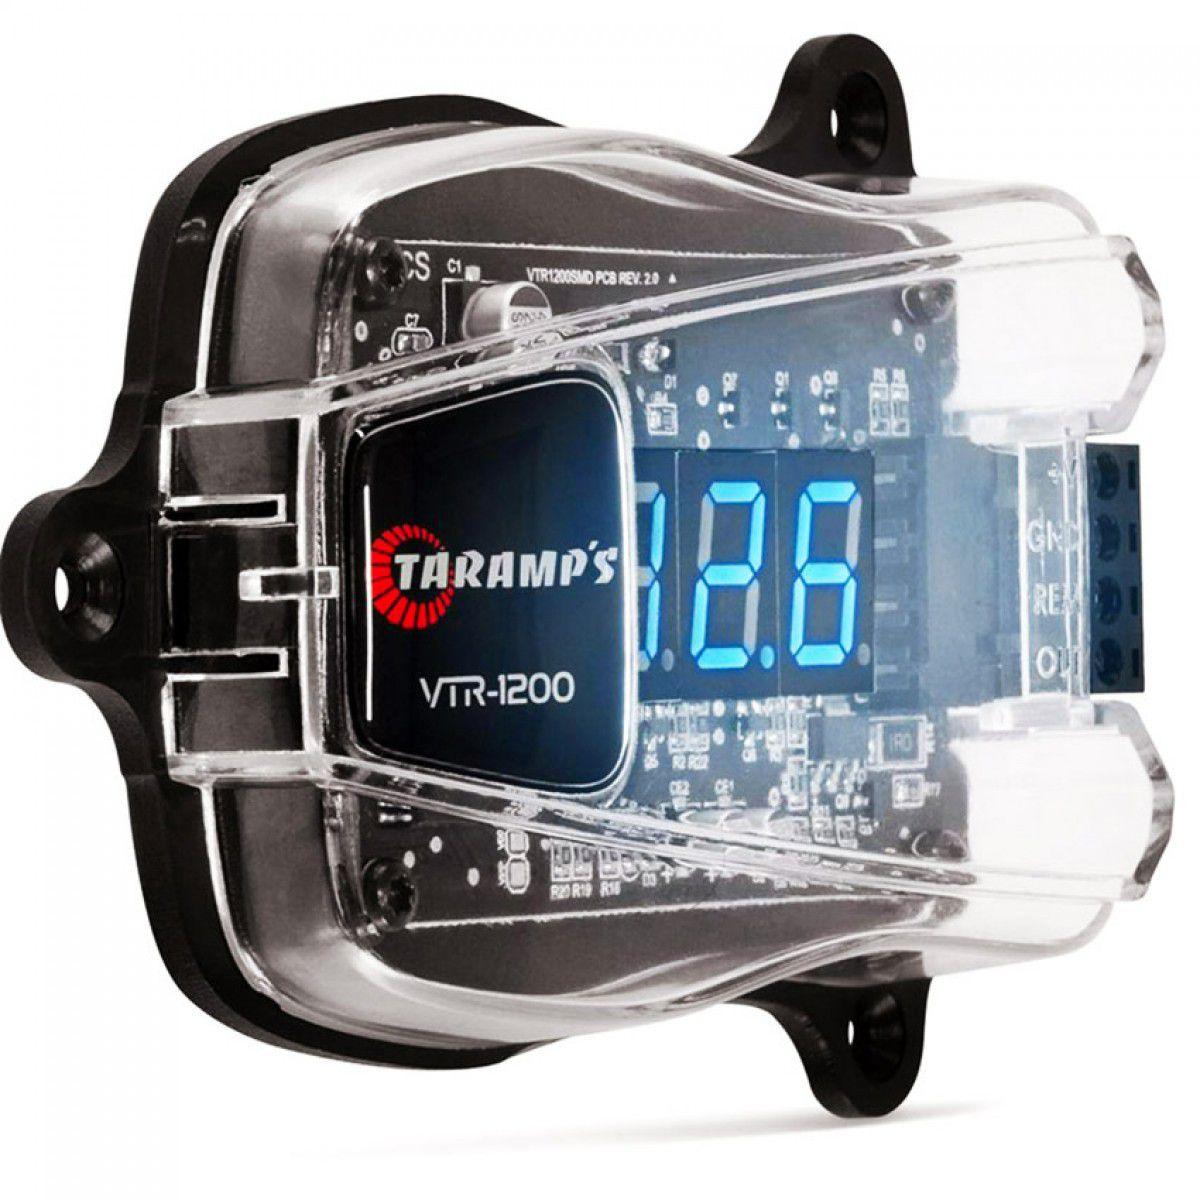 VOLTÍMETRO DIGITAL VTR-1200 TARAMP'S